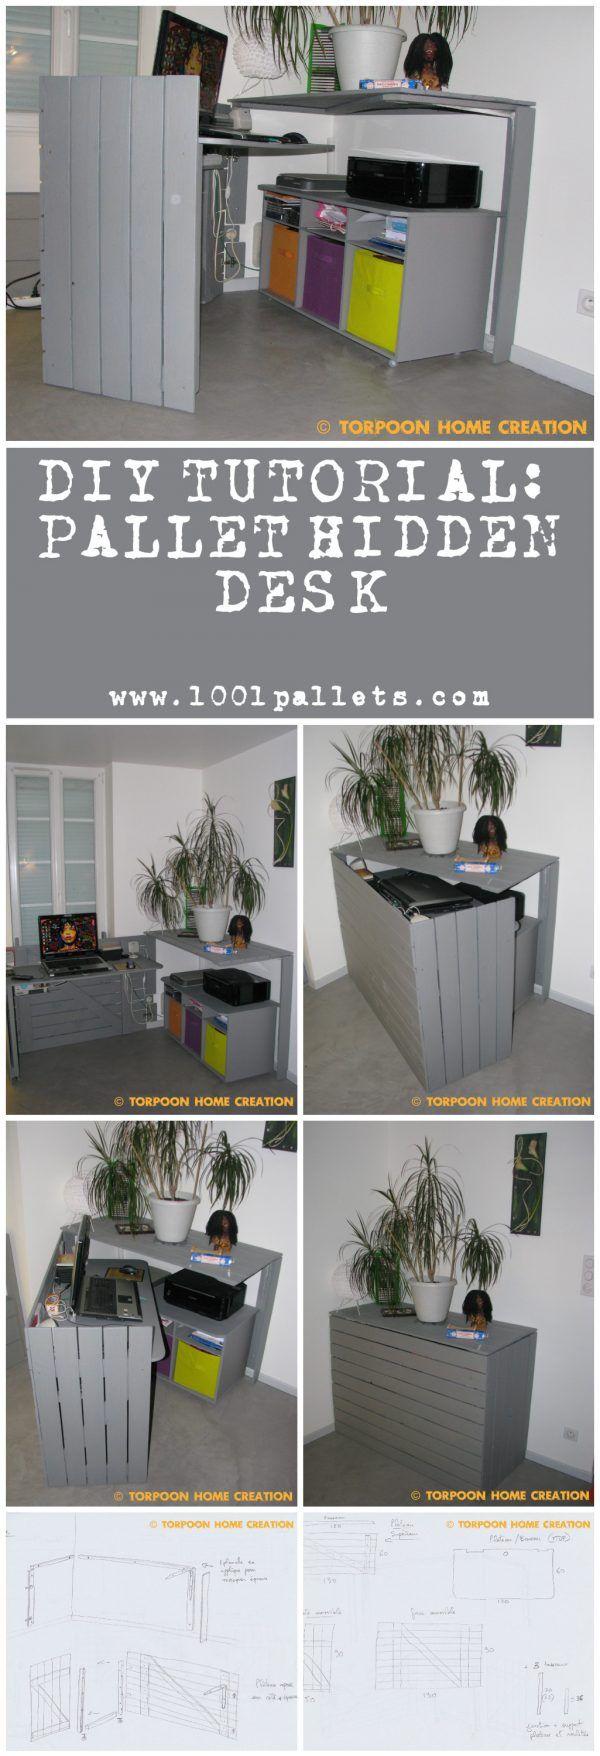 Diy Tutorial: Pallet Hidden Desk Step-by-step Printable PDF Tutorials